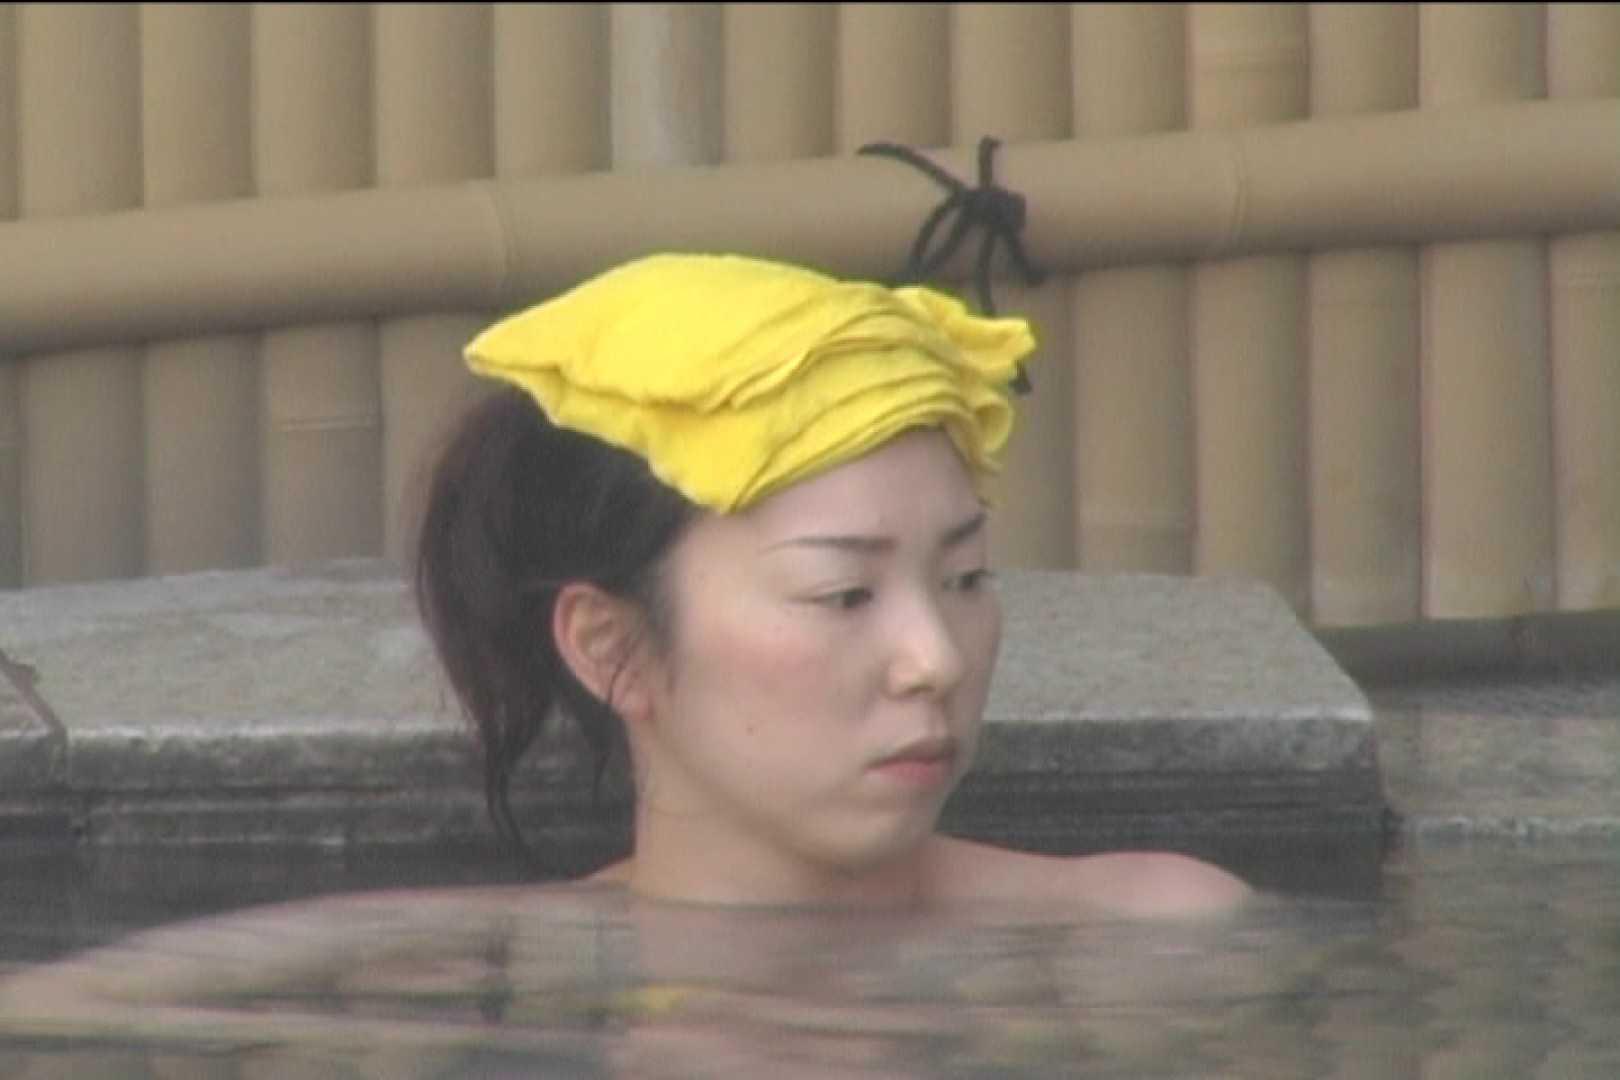 Aquaな露天風呂Vol.529 盗撮映像  51Pix 37